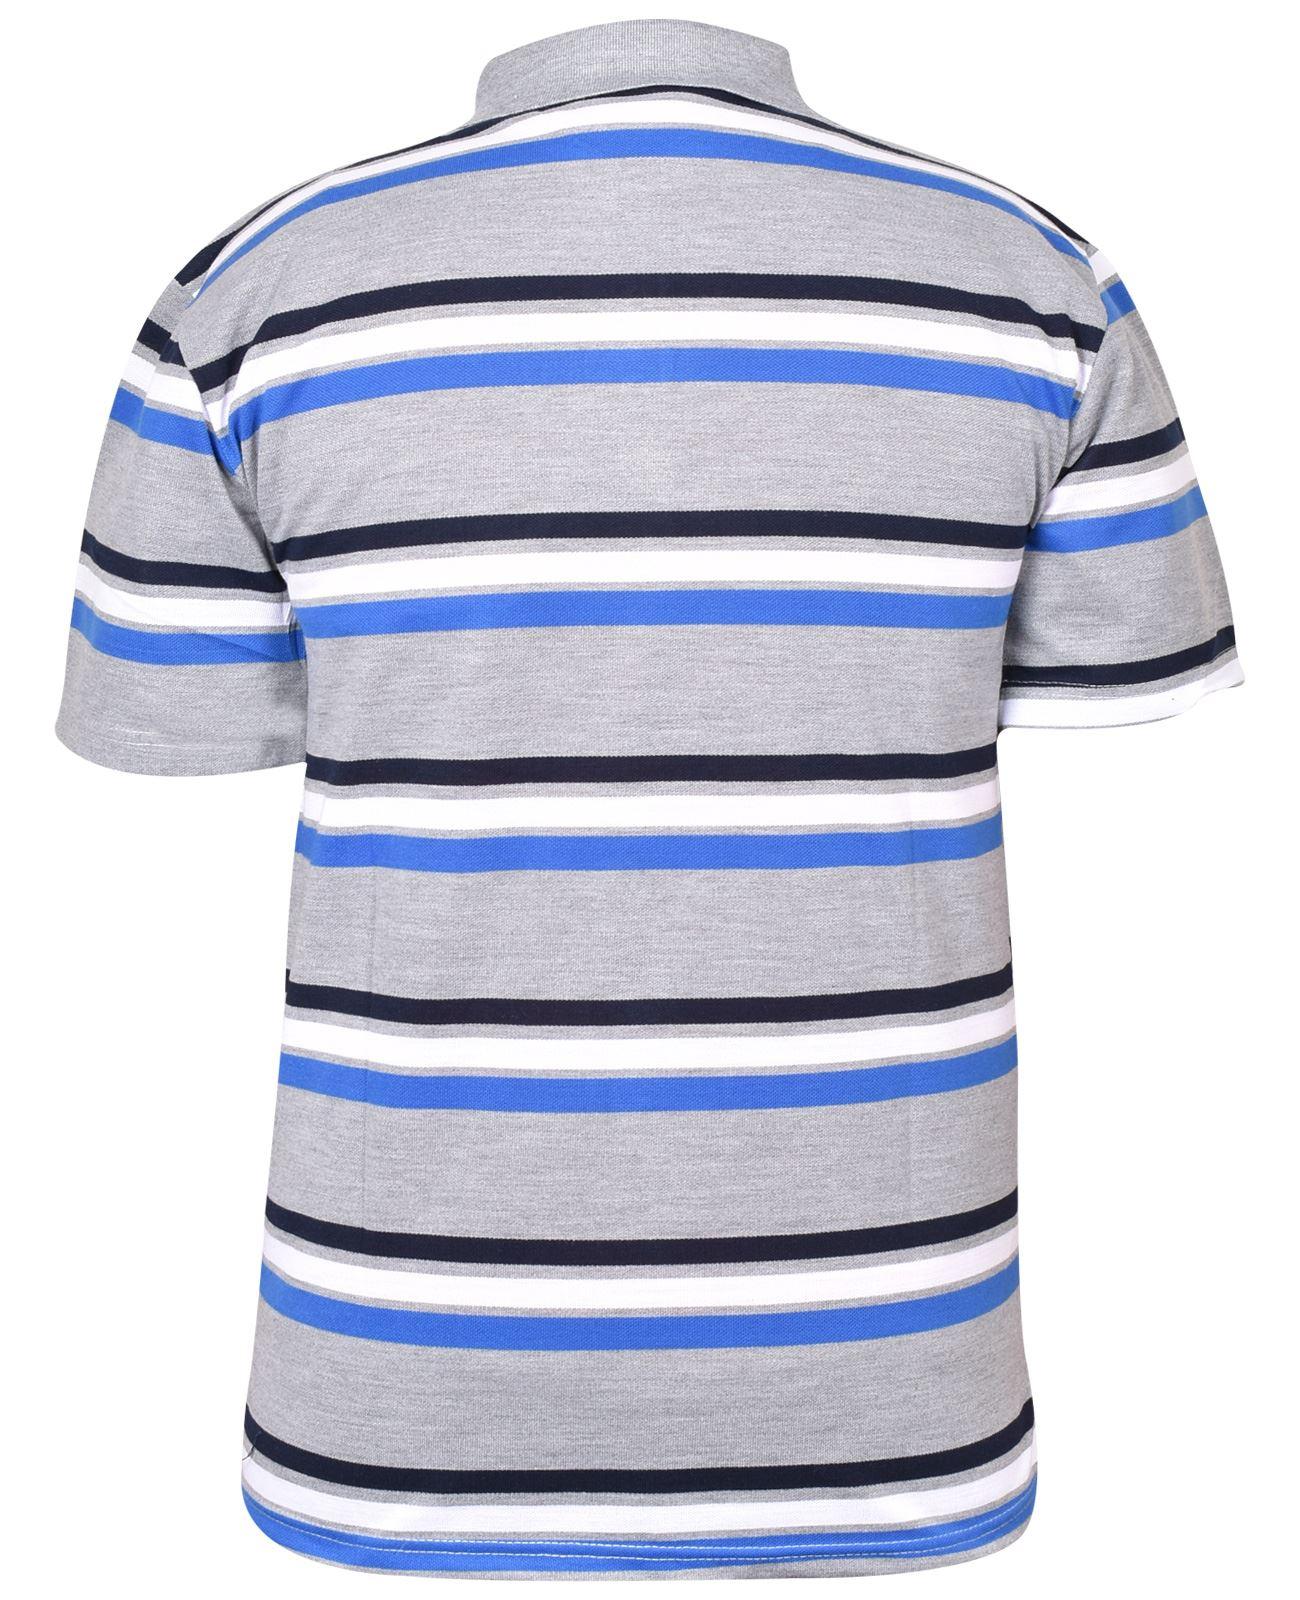 Mens-T-Shirts-Yarn-Dyed-Strip-Pocket-Polo-Shirt-Top-Multi-Colour-Size-M-3XL thumbnail 8